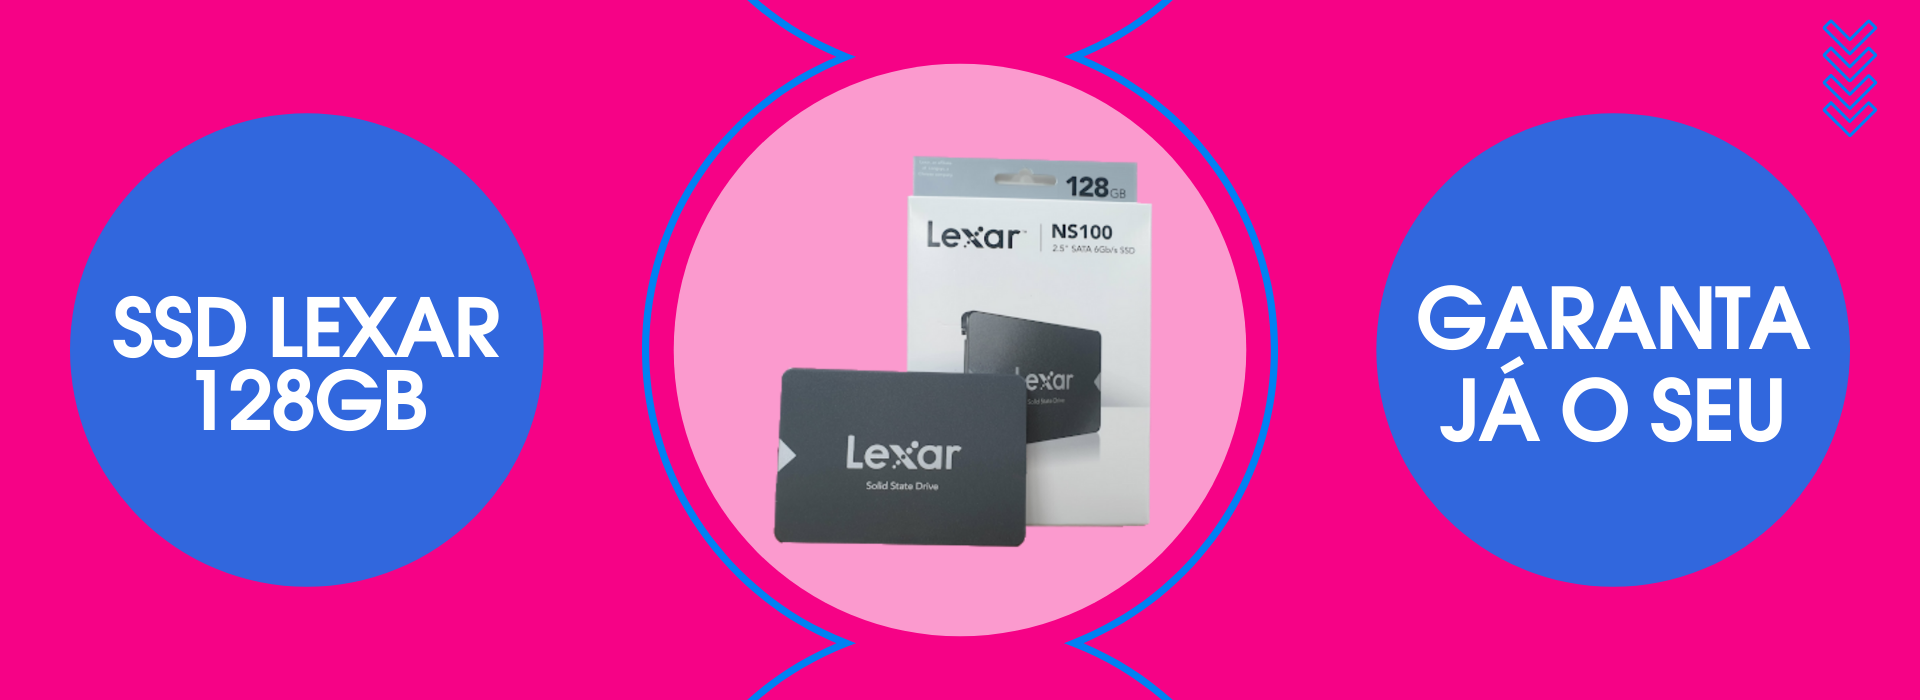 SSD Lexar